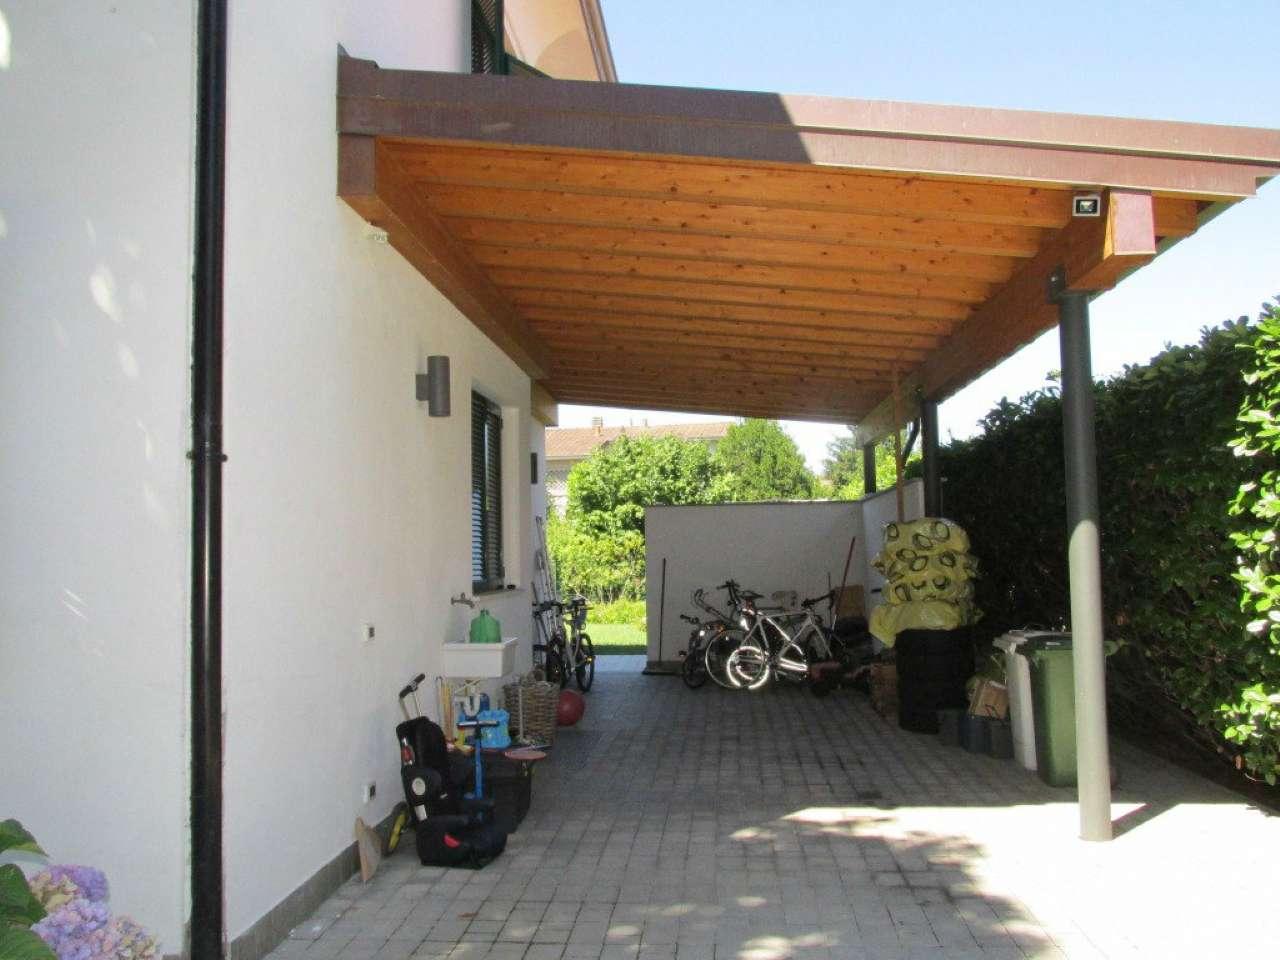 Villa in Vendita a Segrate: 5 locali, 300 mq - Foto 7